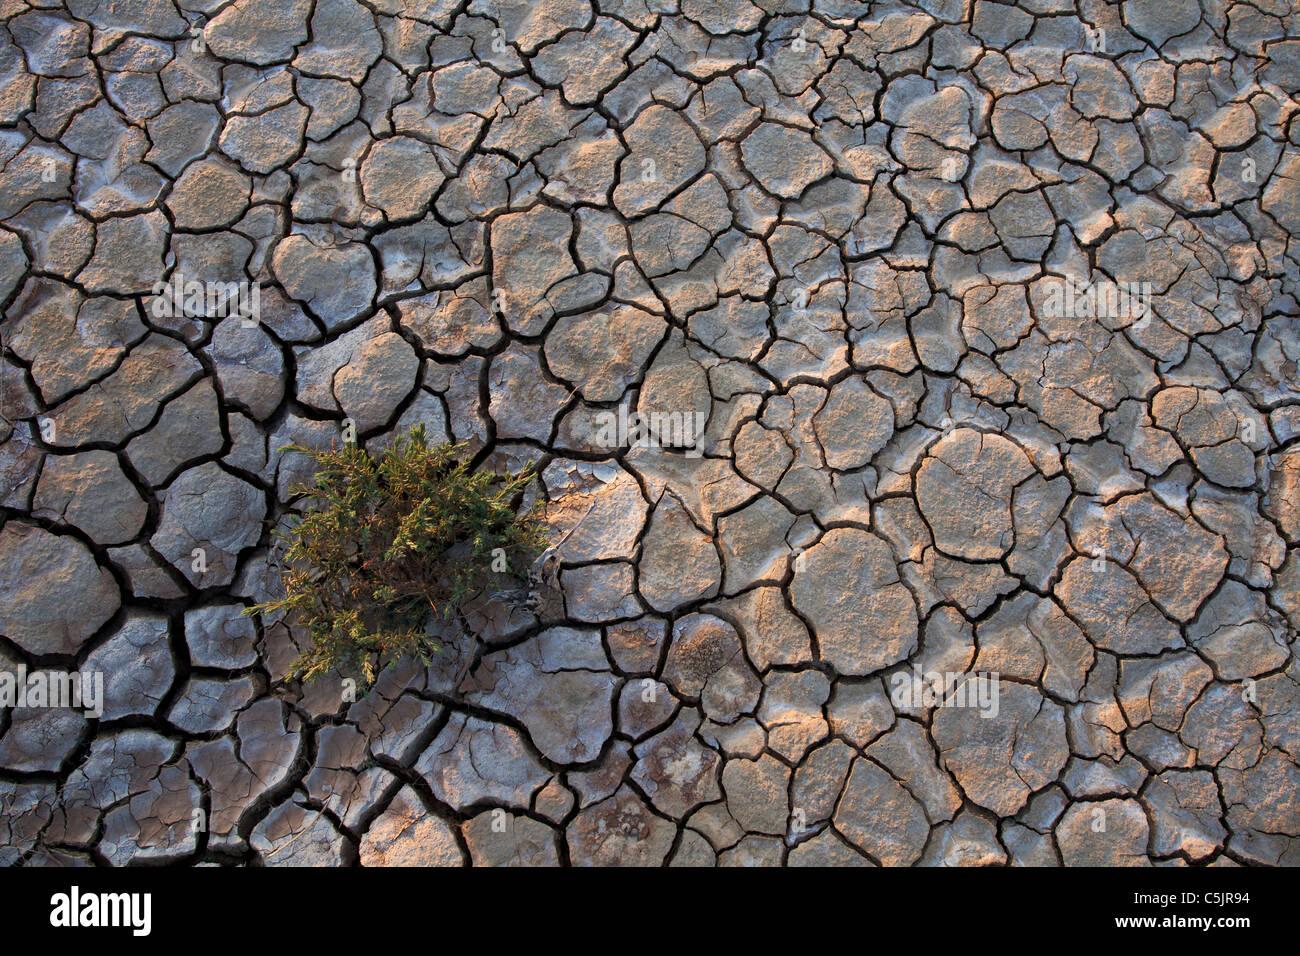 Dry Lake bed, Anza-Borrego Desert State Park, Californie. Photo Stock